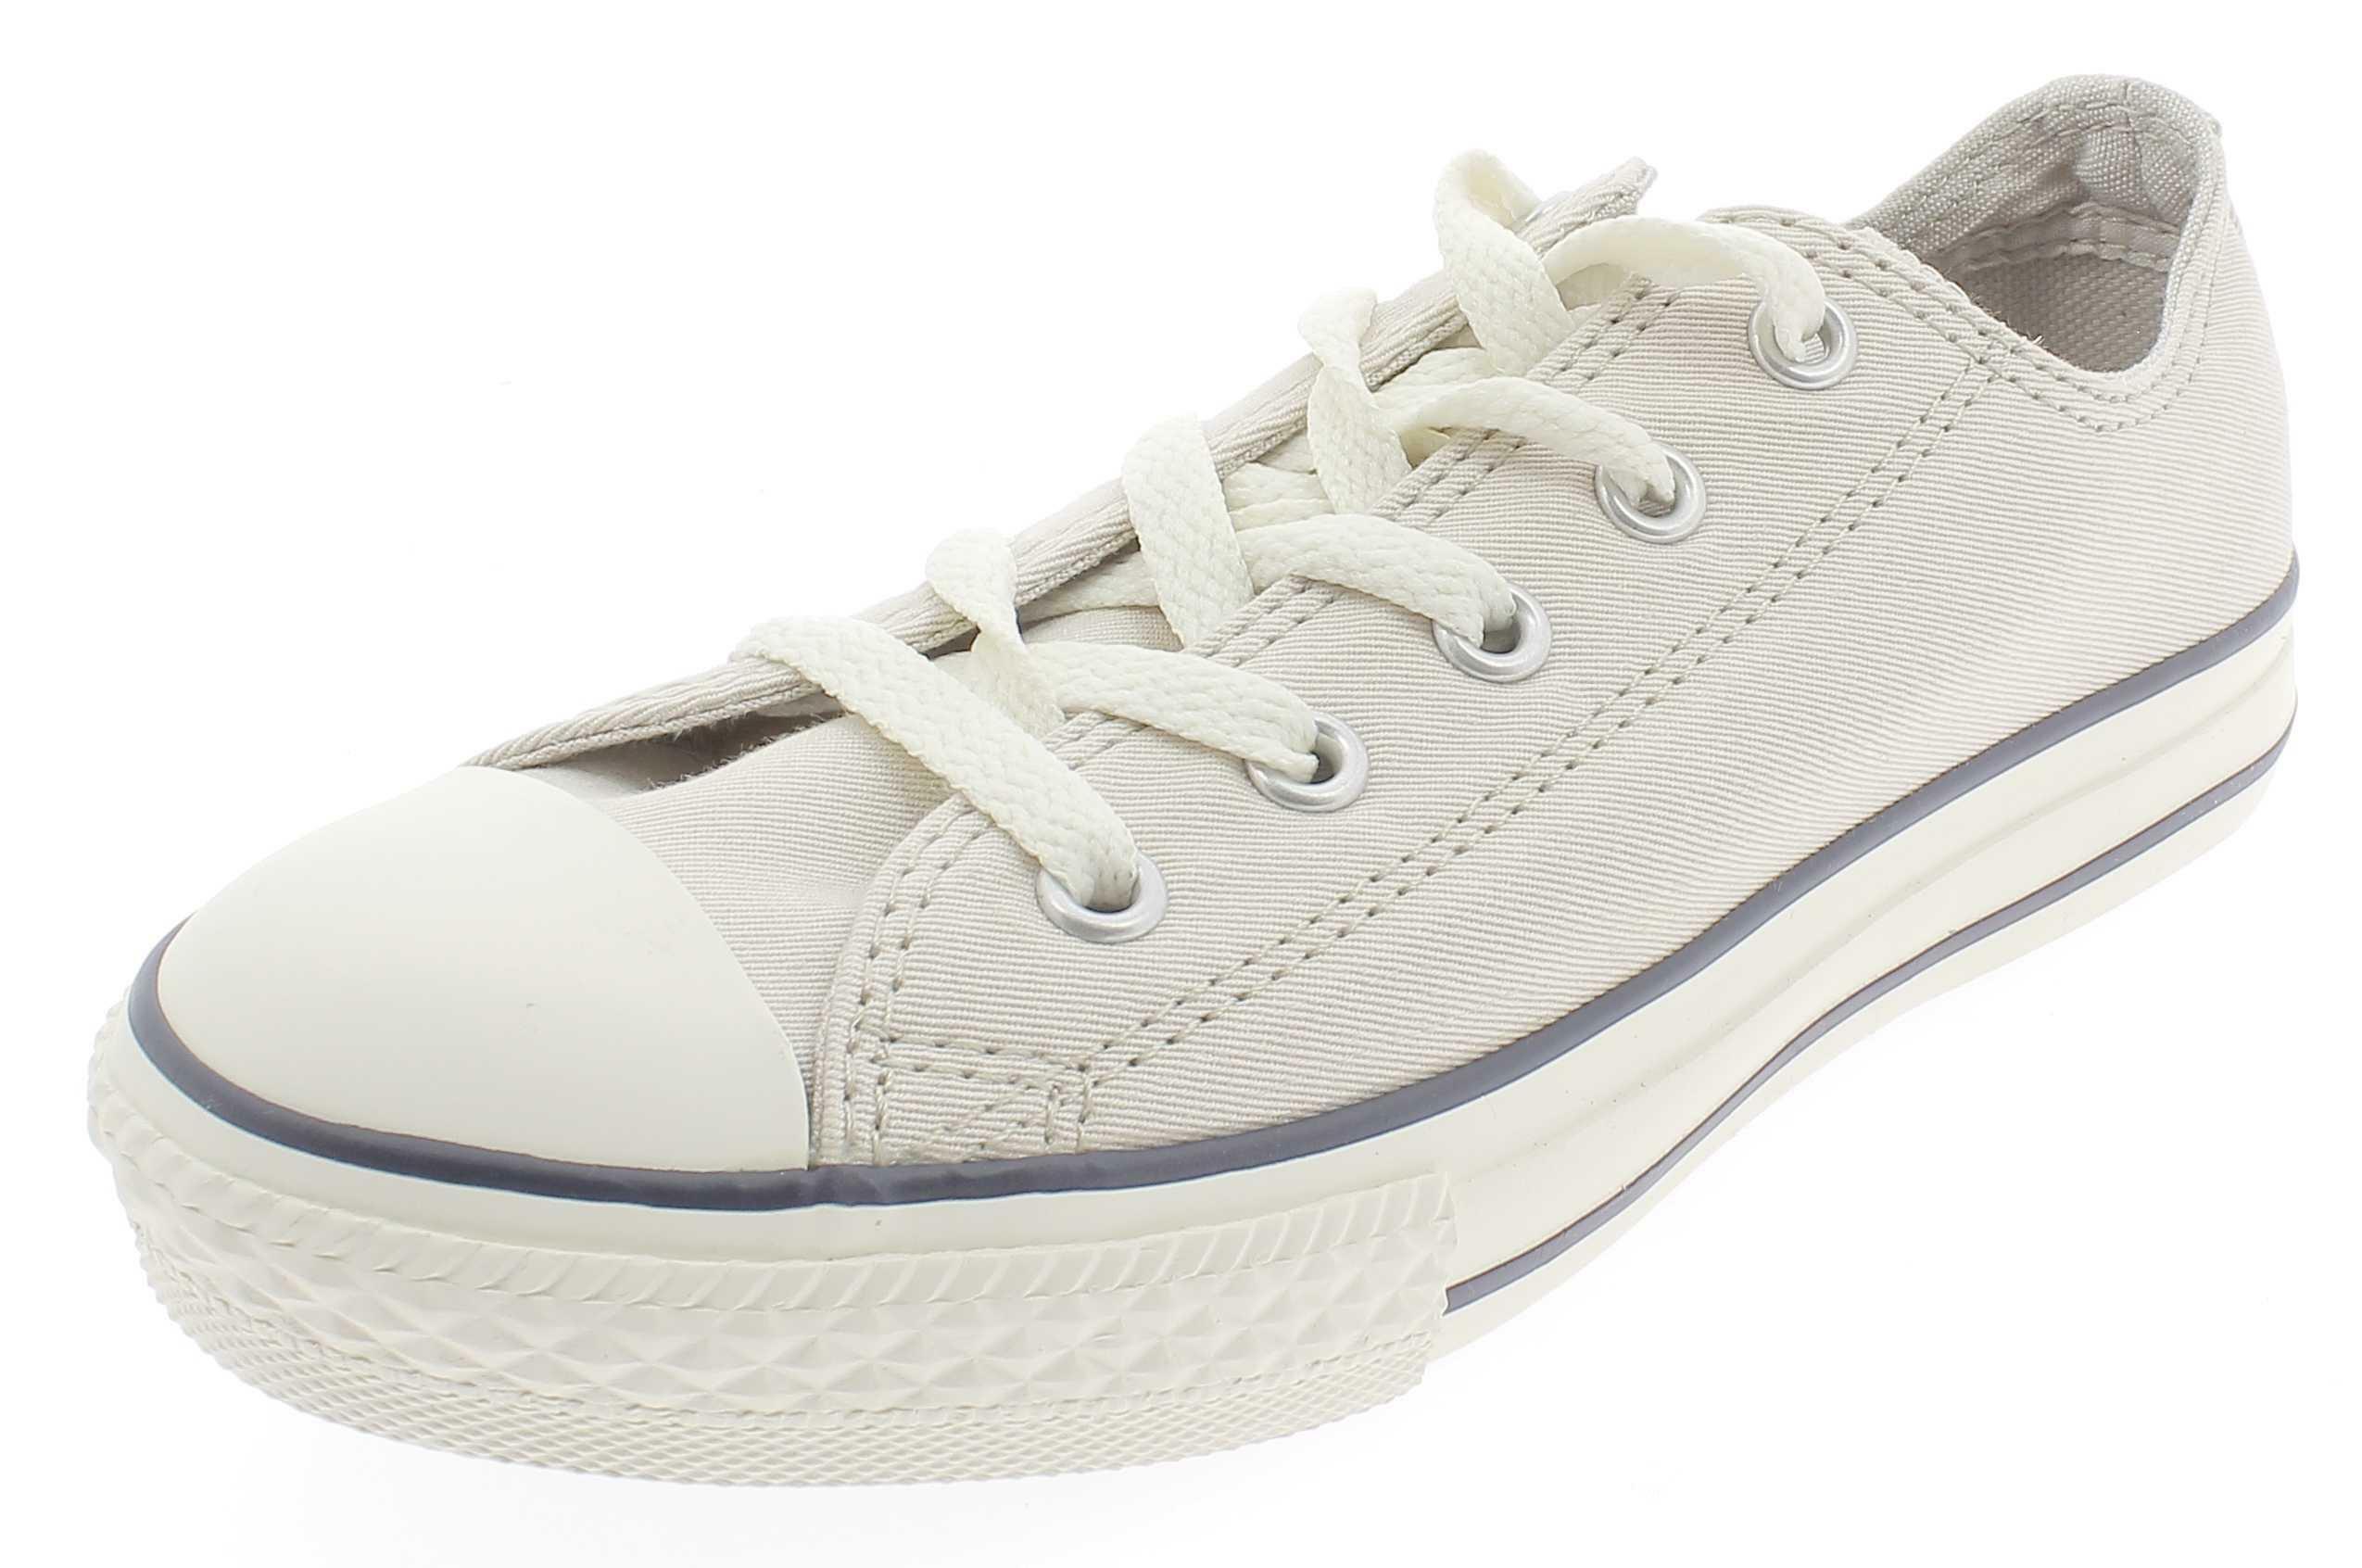 converse all star scarpe sneakers junior bassa low beige 630424c